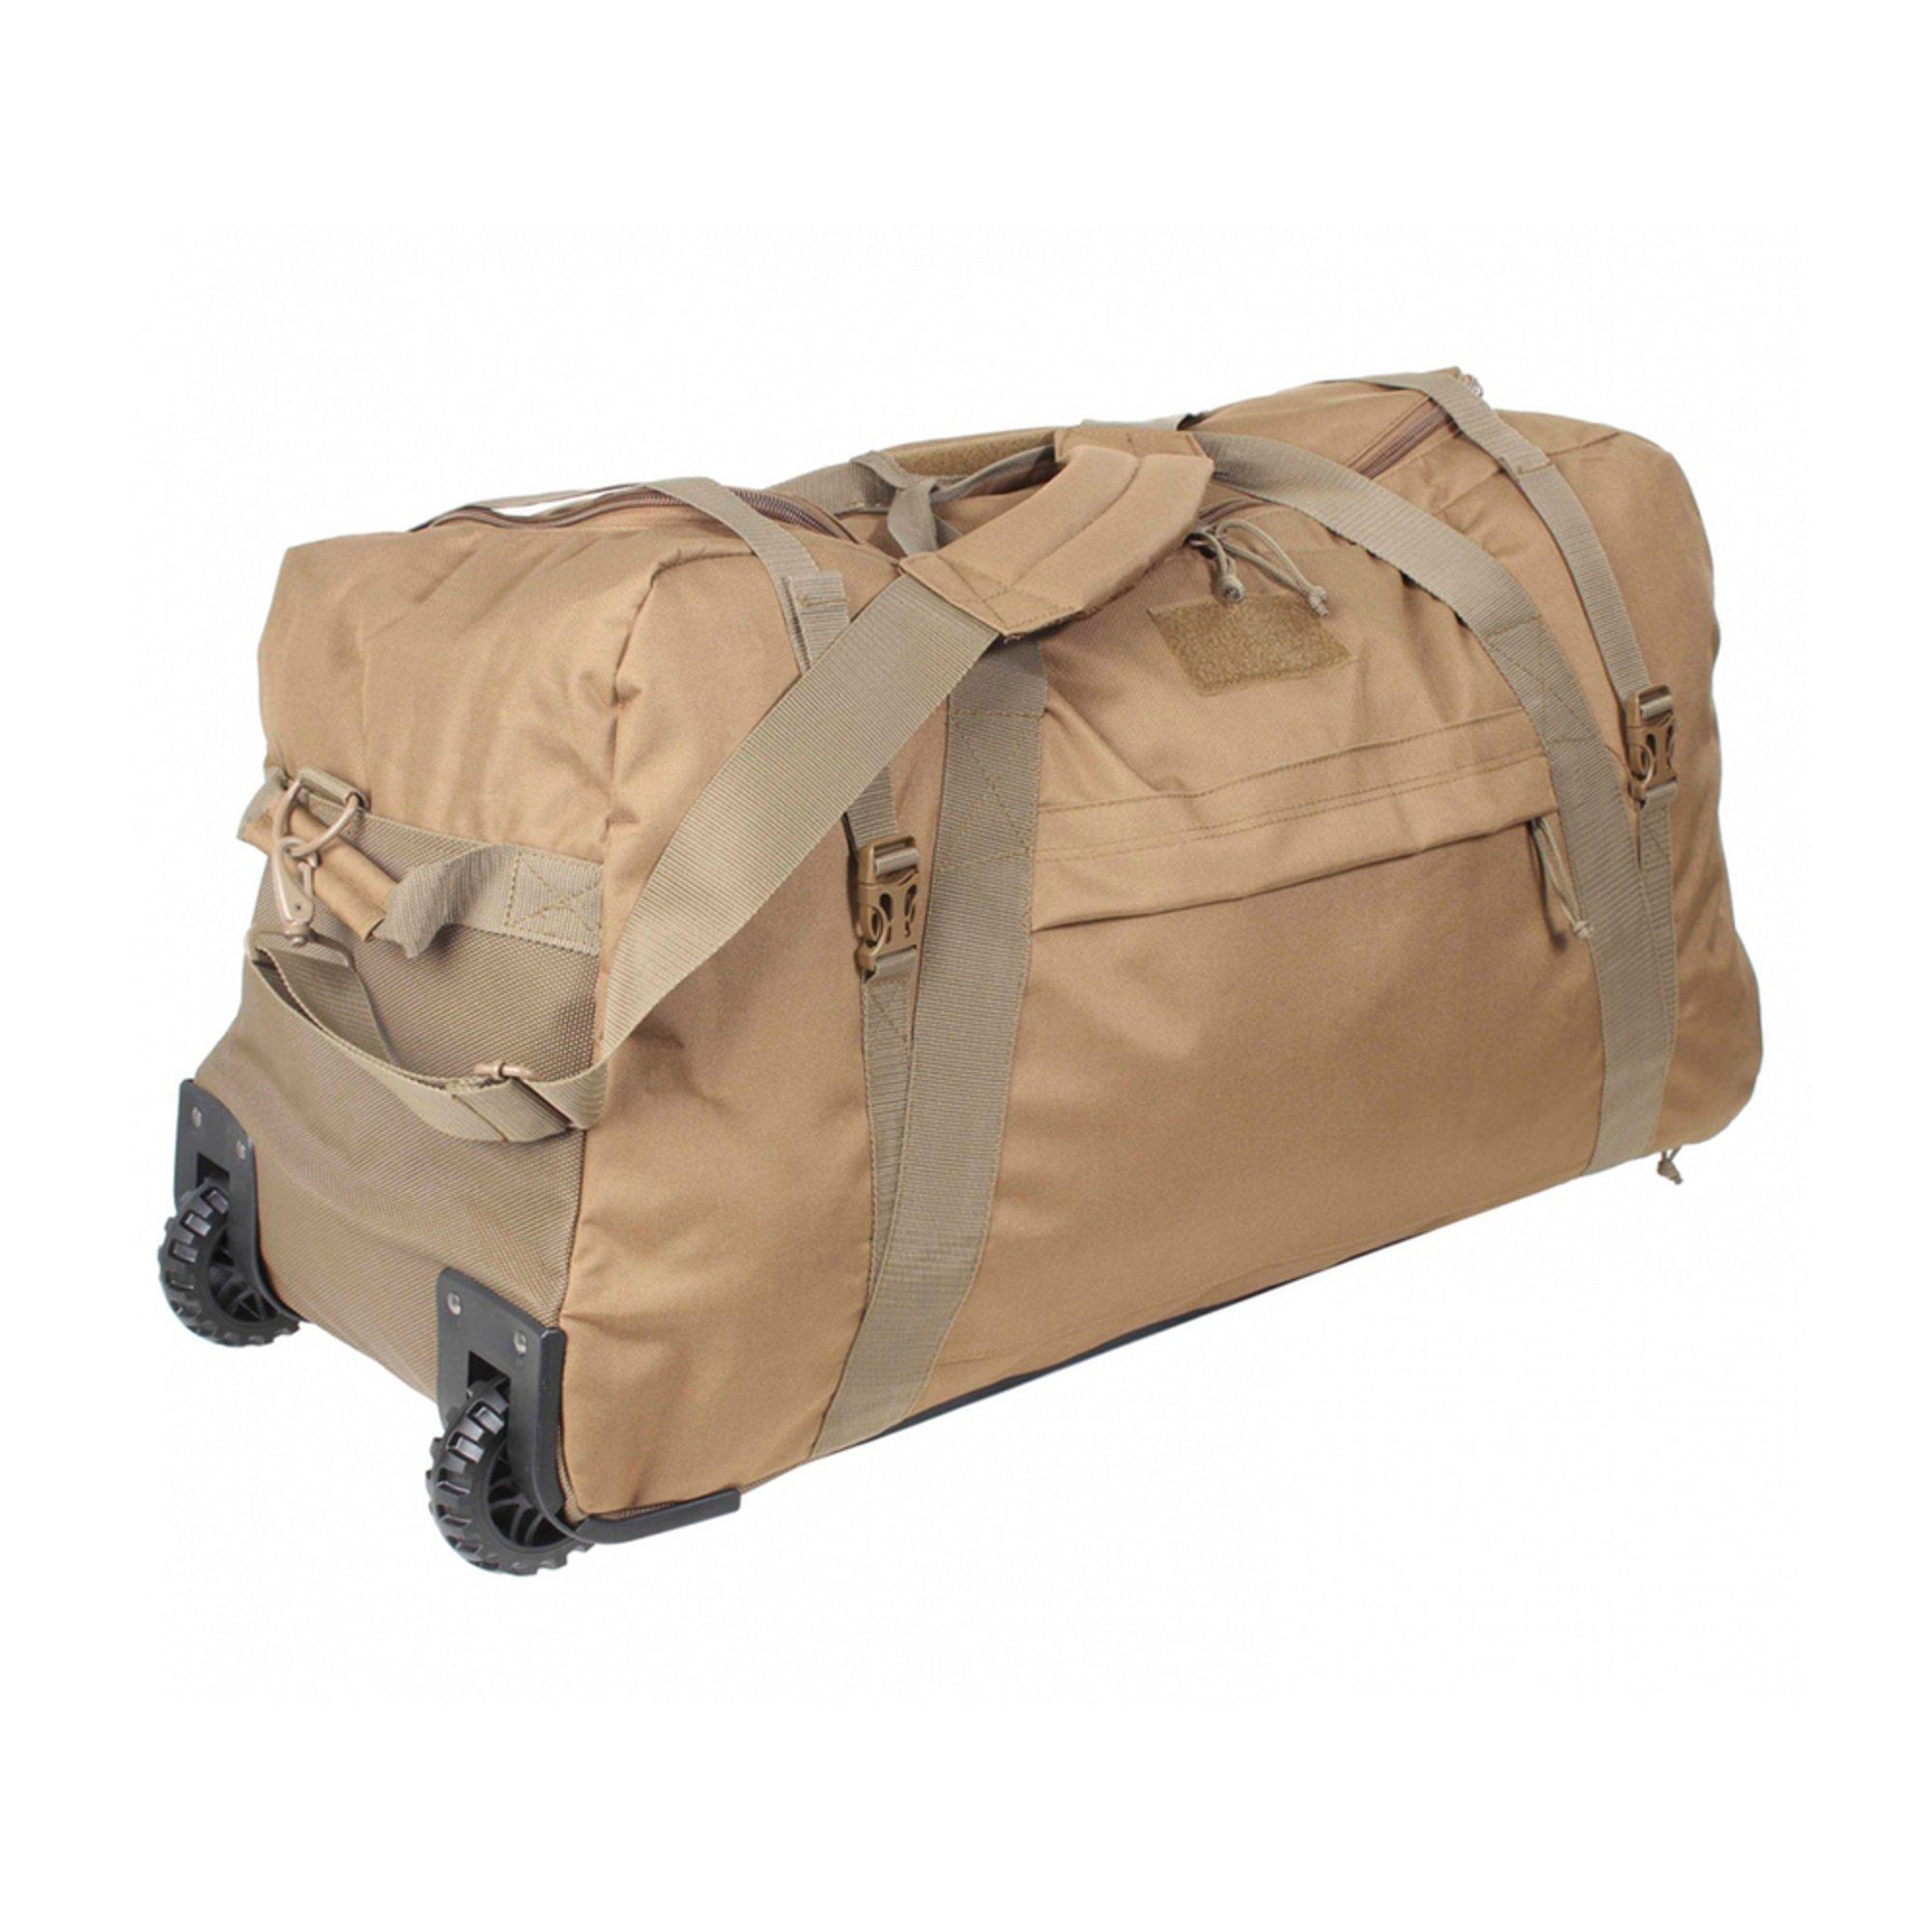 b4e588b81ac0 Sandpiper of California. Sandpiper of California Monster On Wheels Gear Bag